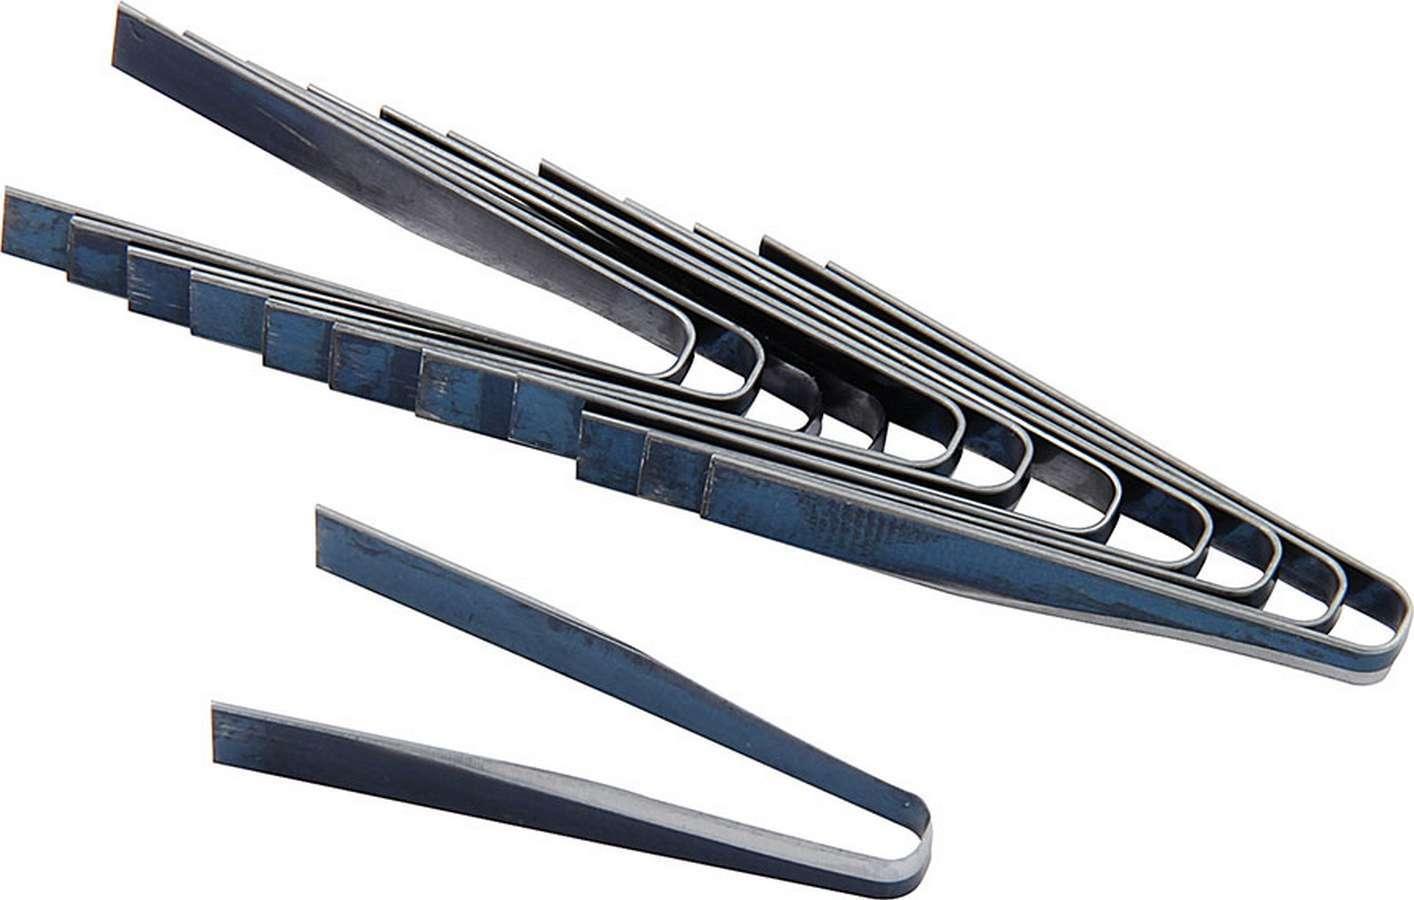 Allstar Performance Flat #5 Blades 5/32in